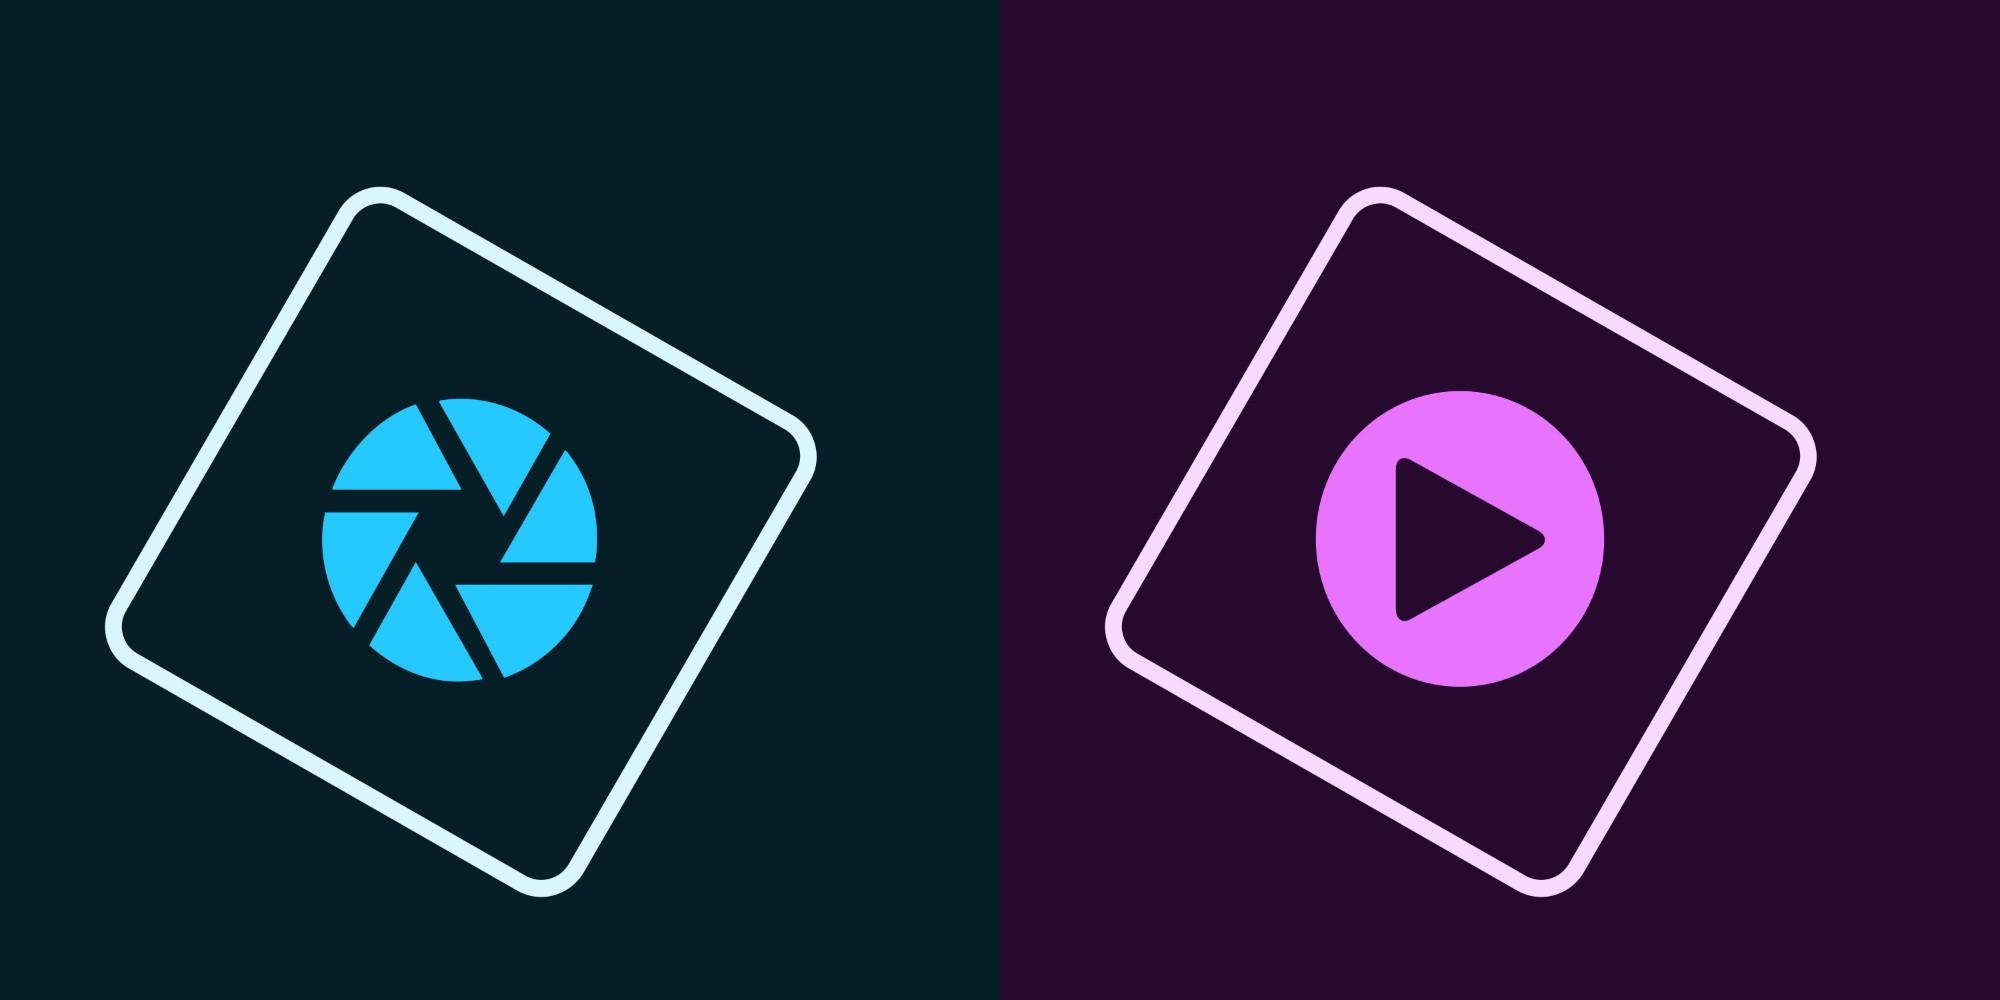 Adobe Photoshop Elements 2021 & Premiere Elements 2021 Win 1 license(s)